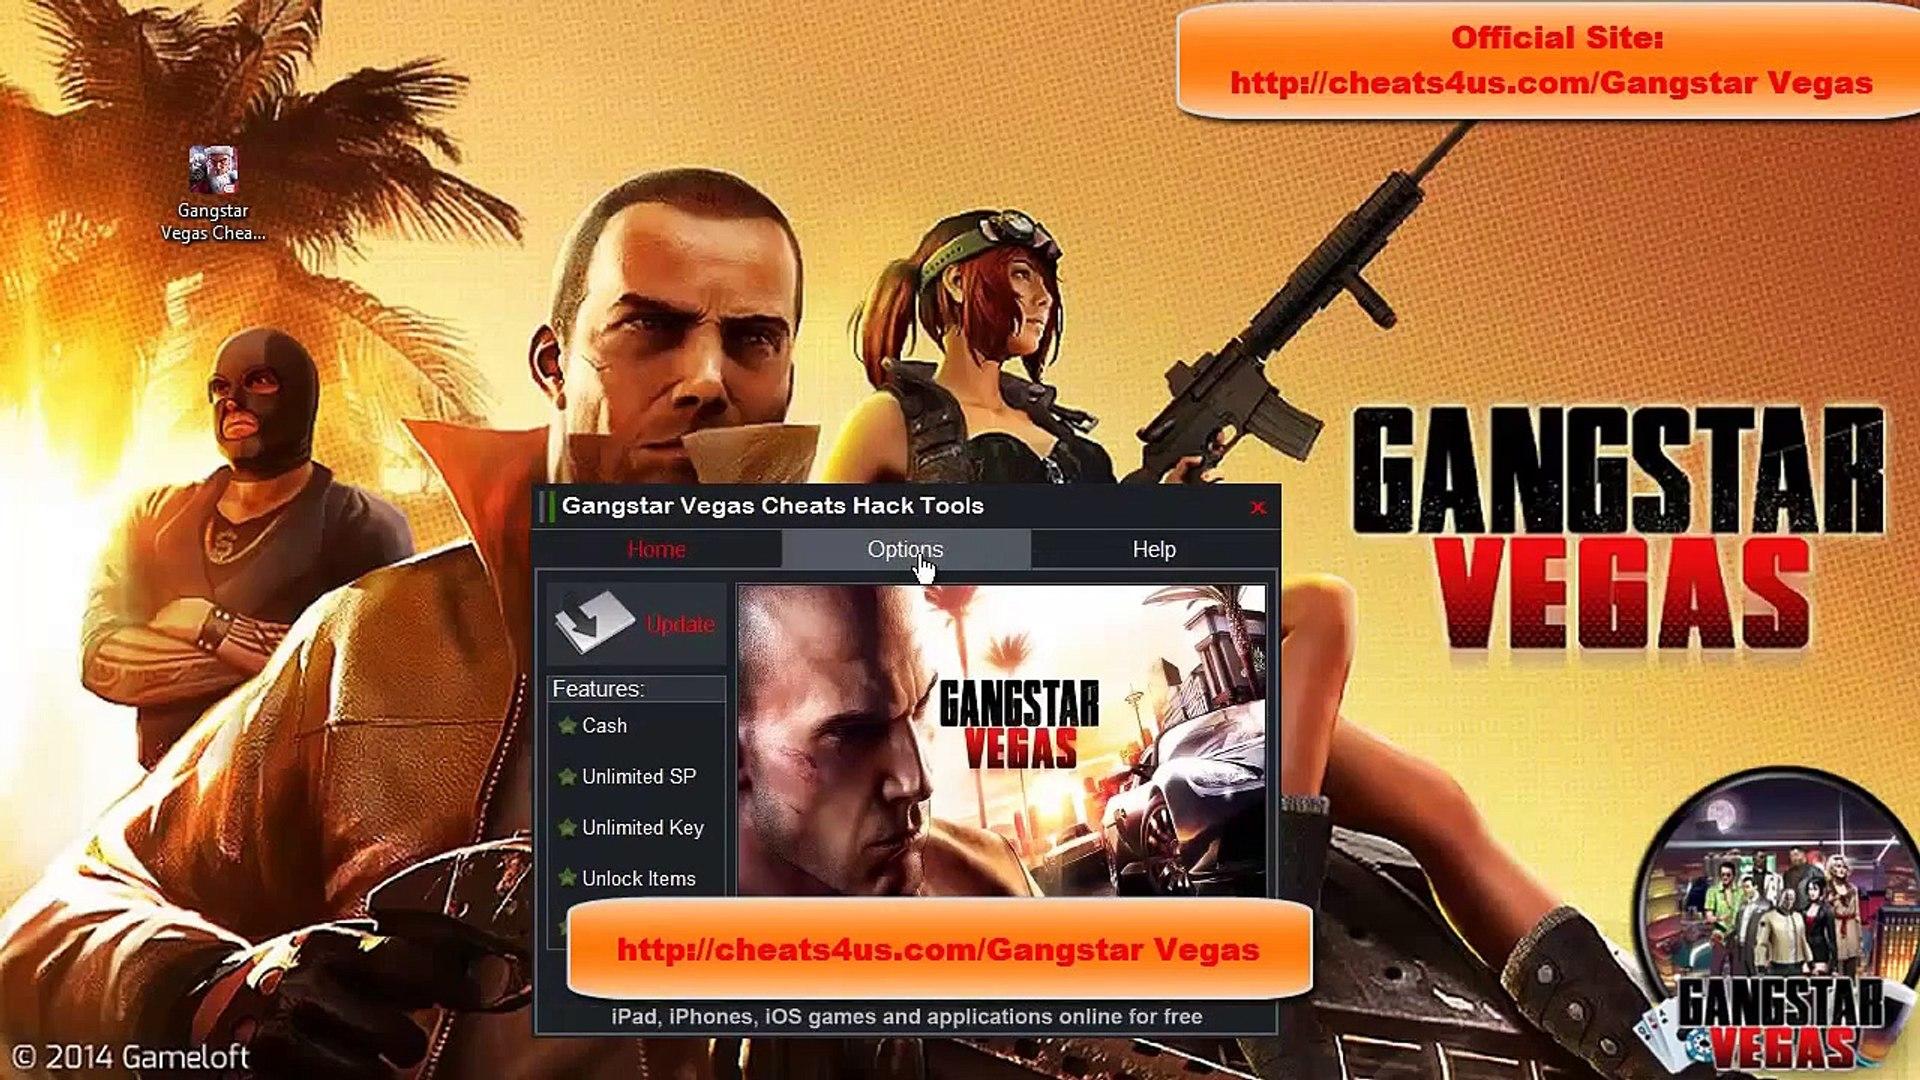 Gangstar Vegas Cheats Hack Tools For Unlimited CashSP Key Unlock  ItemsWeapons - video dailymotion